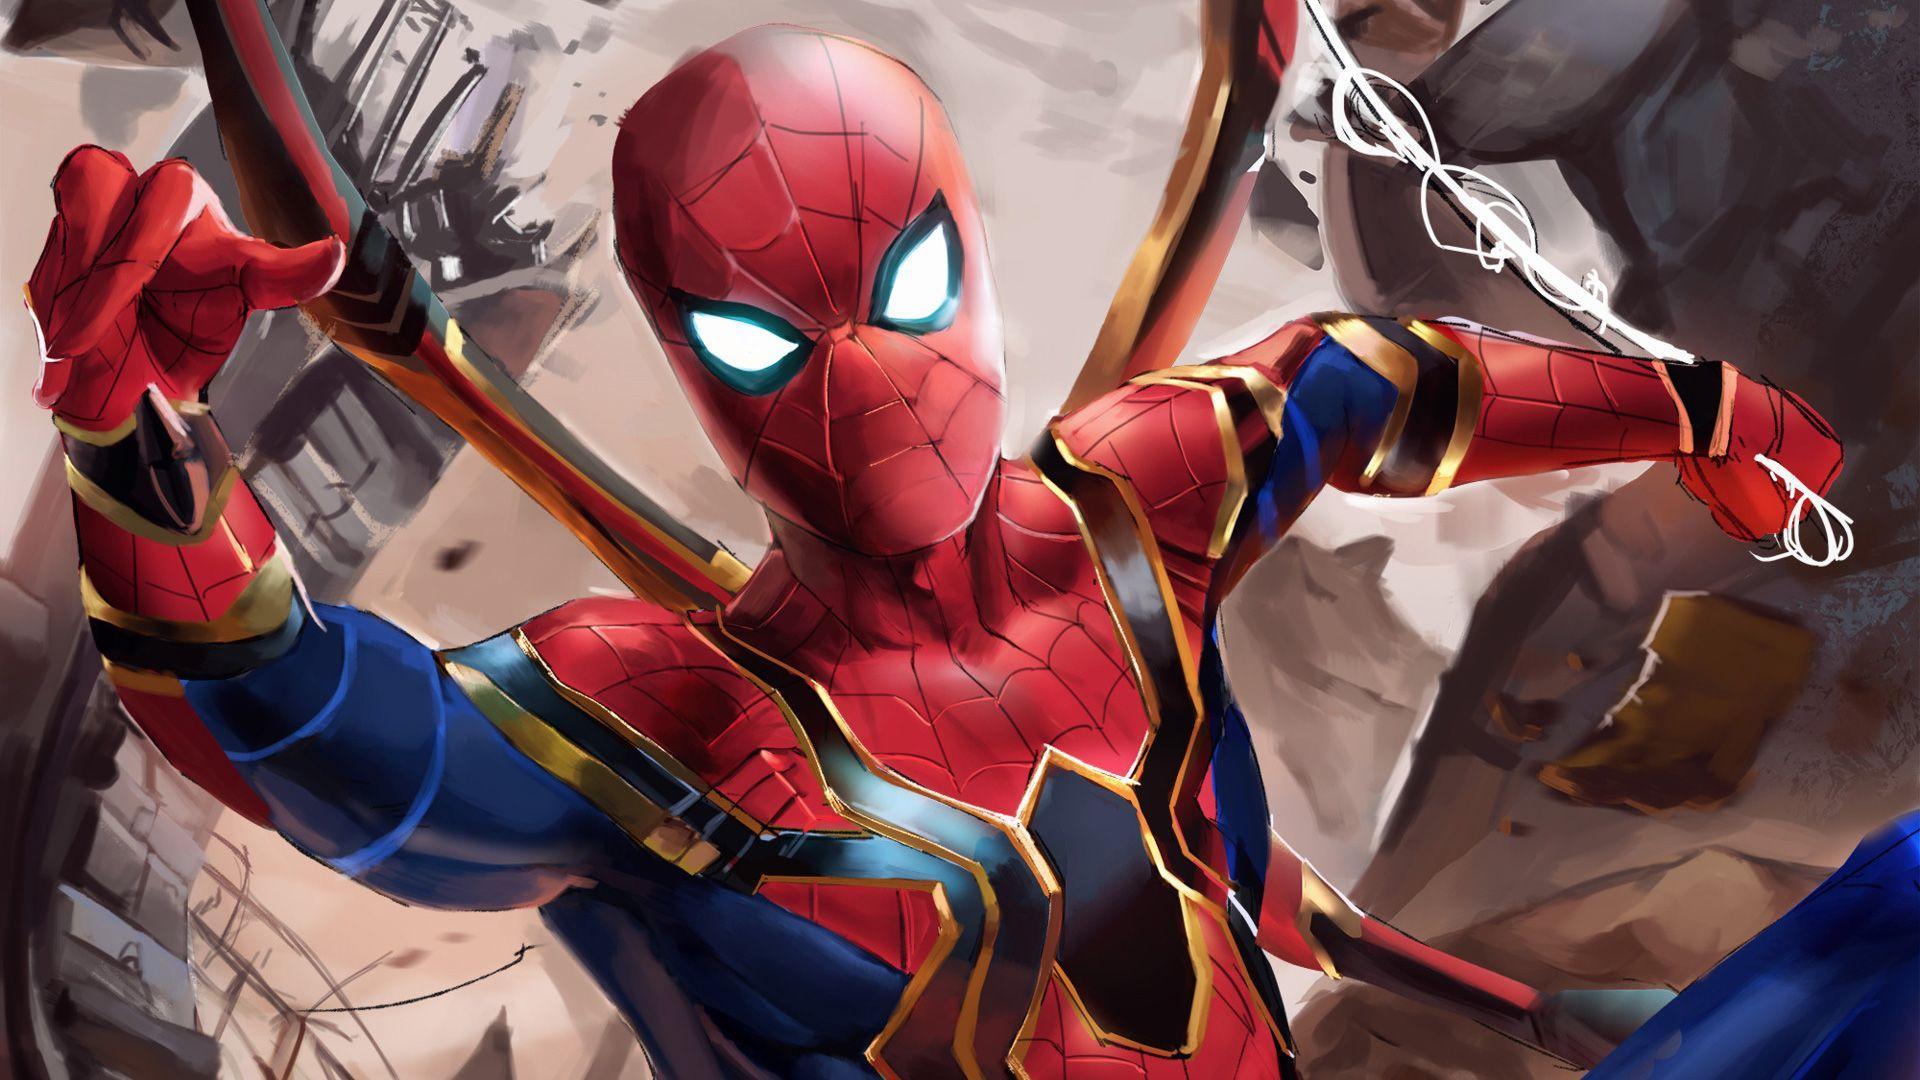 1625258929 Spider Man No Way Home Funko reveals a Spider Man suit that